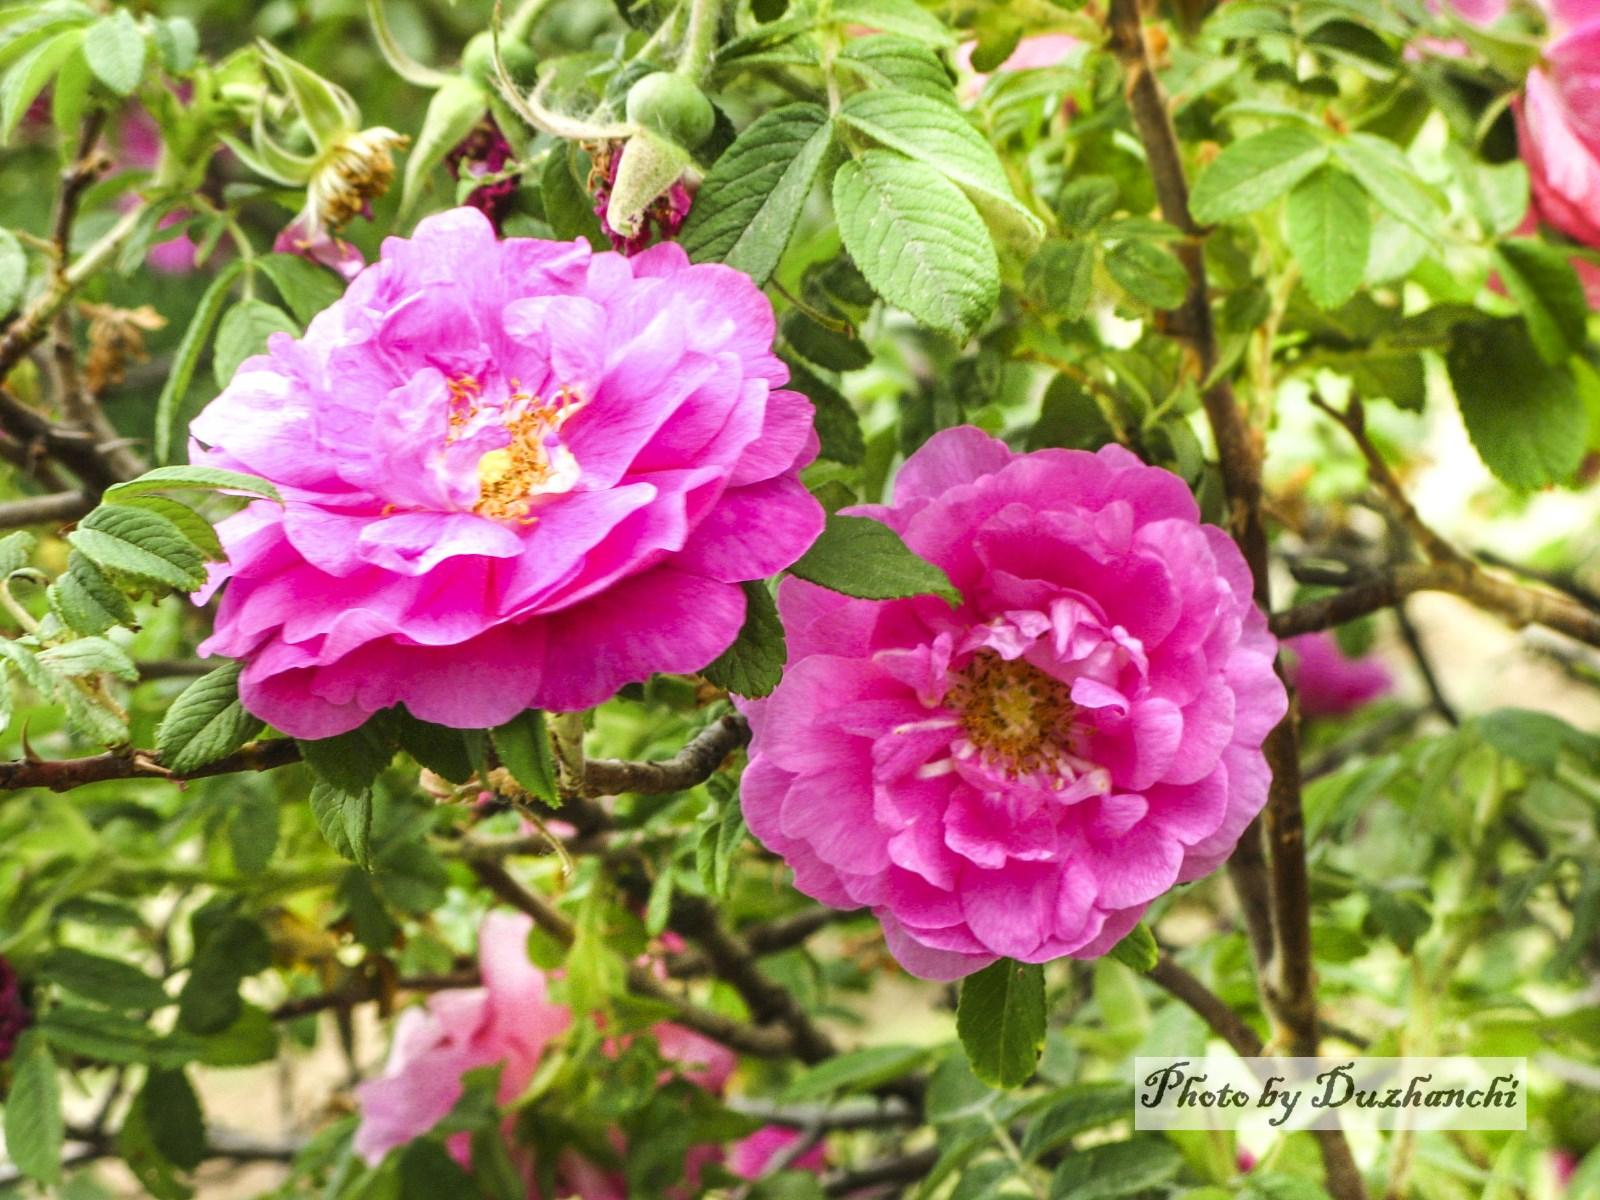 1IMG_0065玫瑰(植物所)_1水印.jpg